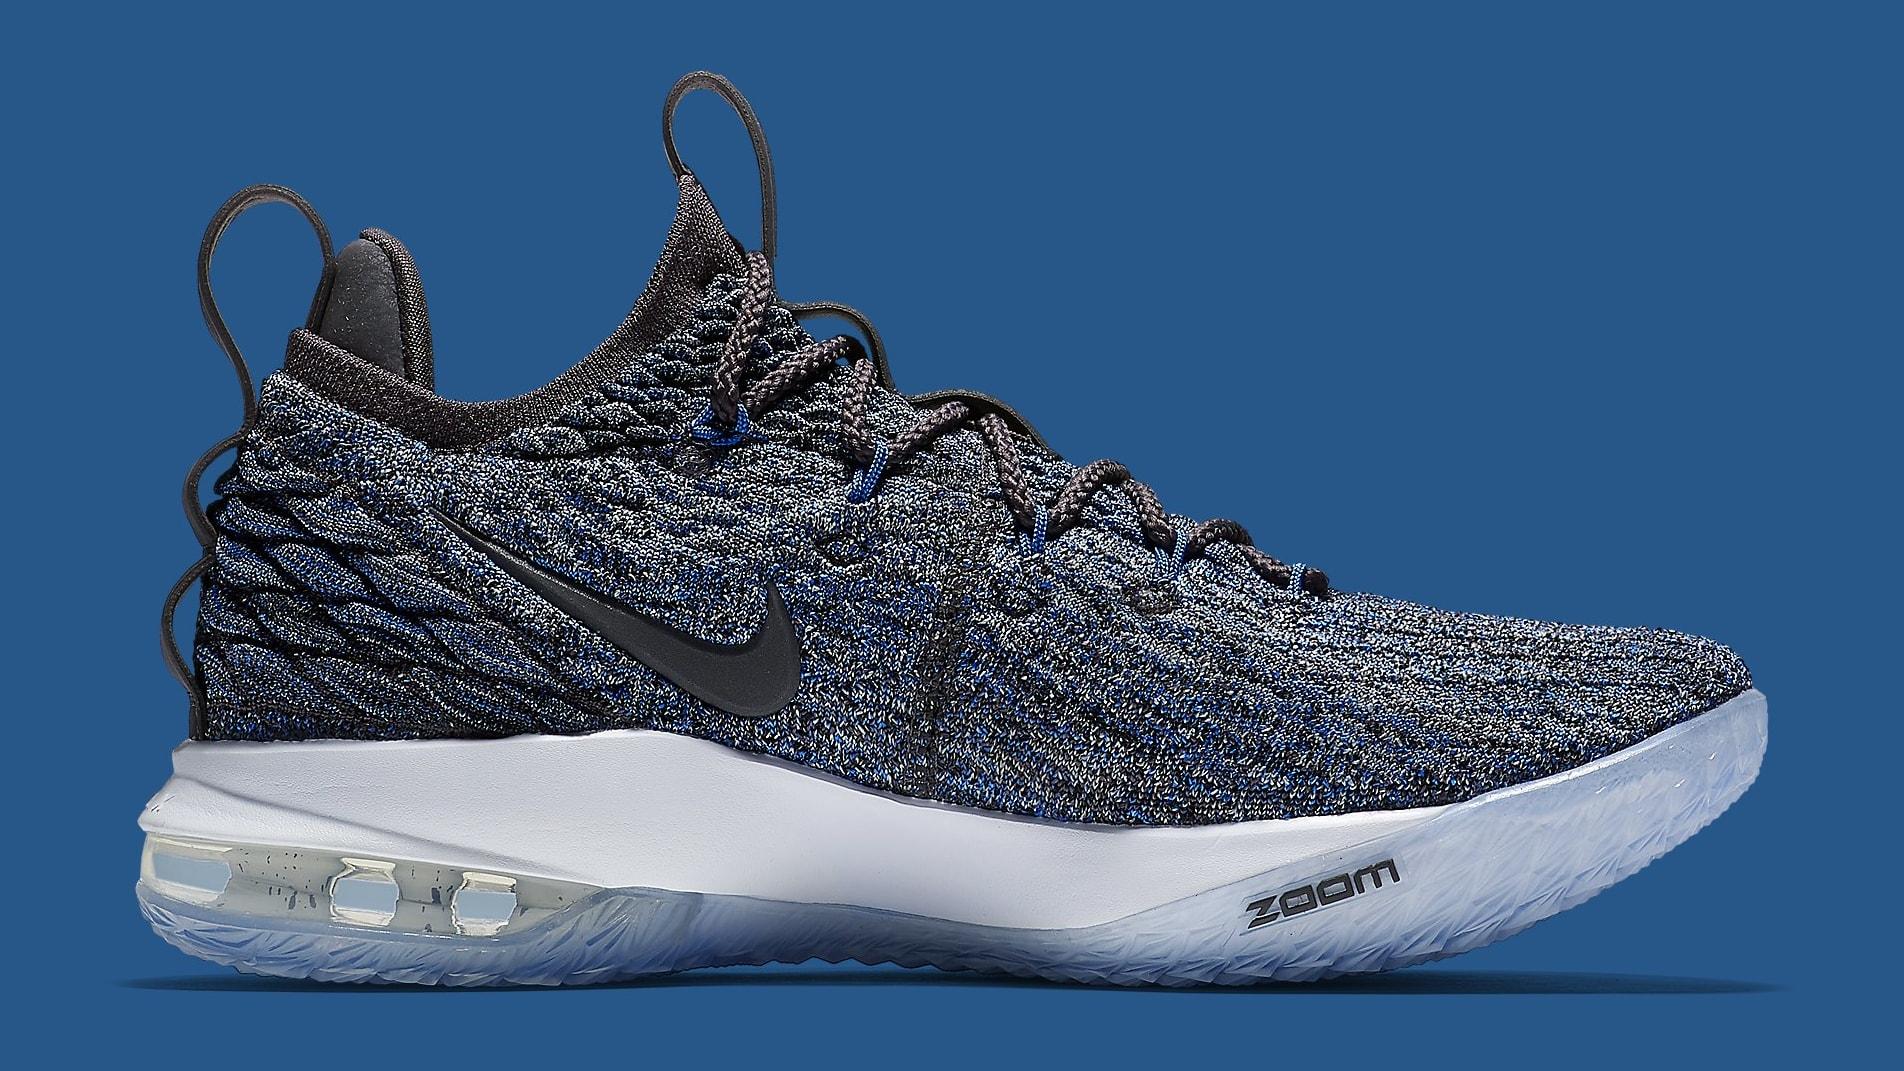 sale retailer 6a95e be183 Nike Lebron 15 Low Signal Blue Nike Vortex Vintage Retro ...